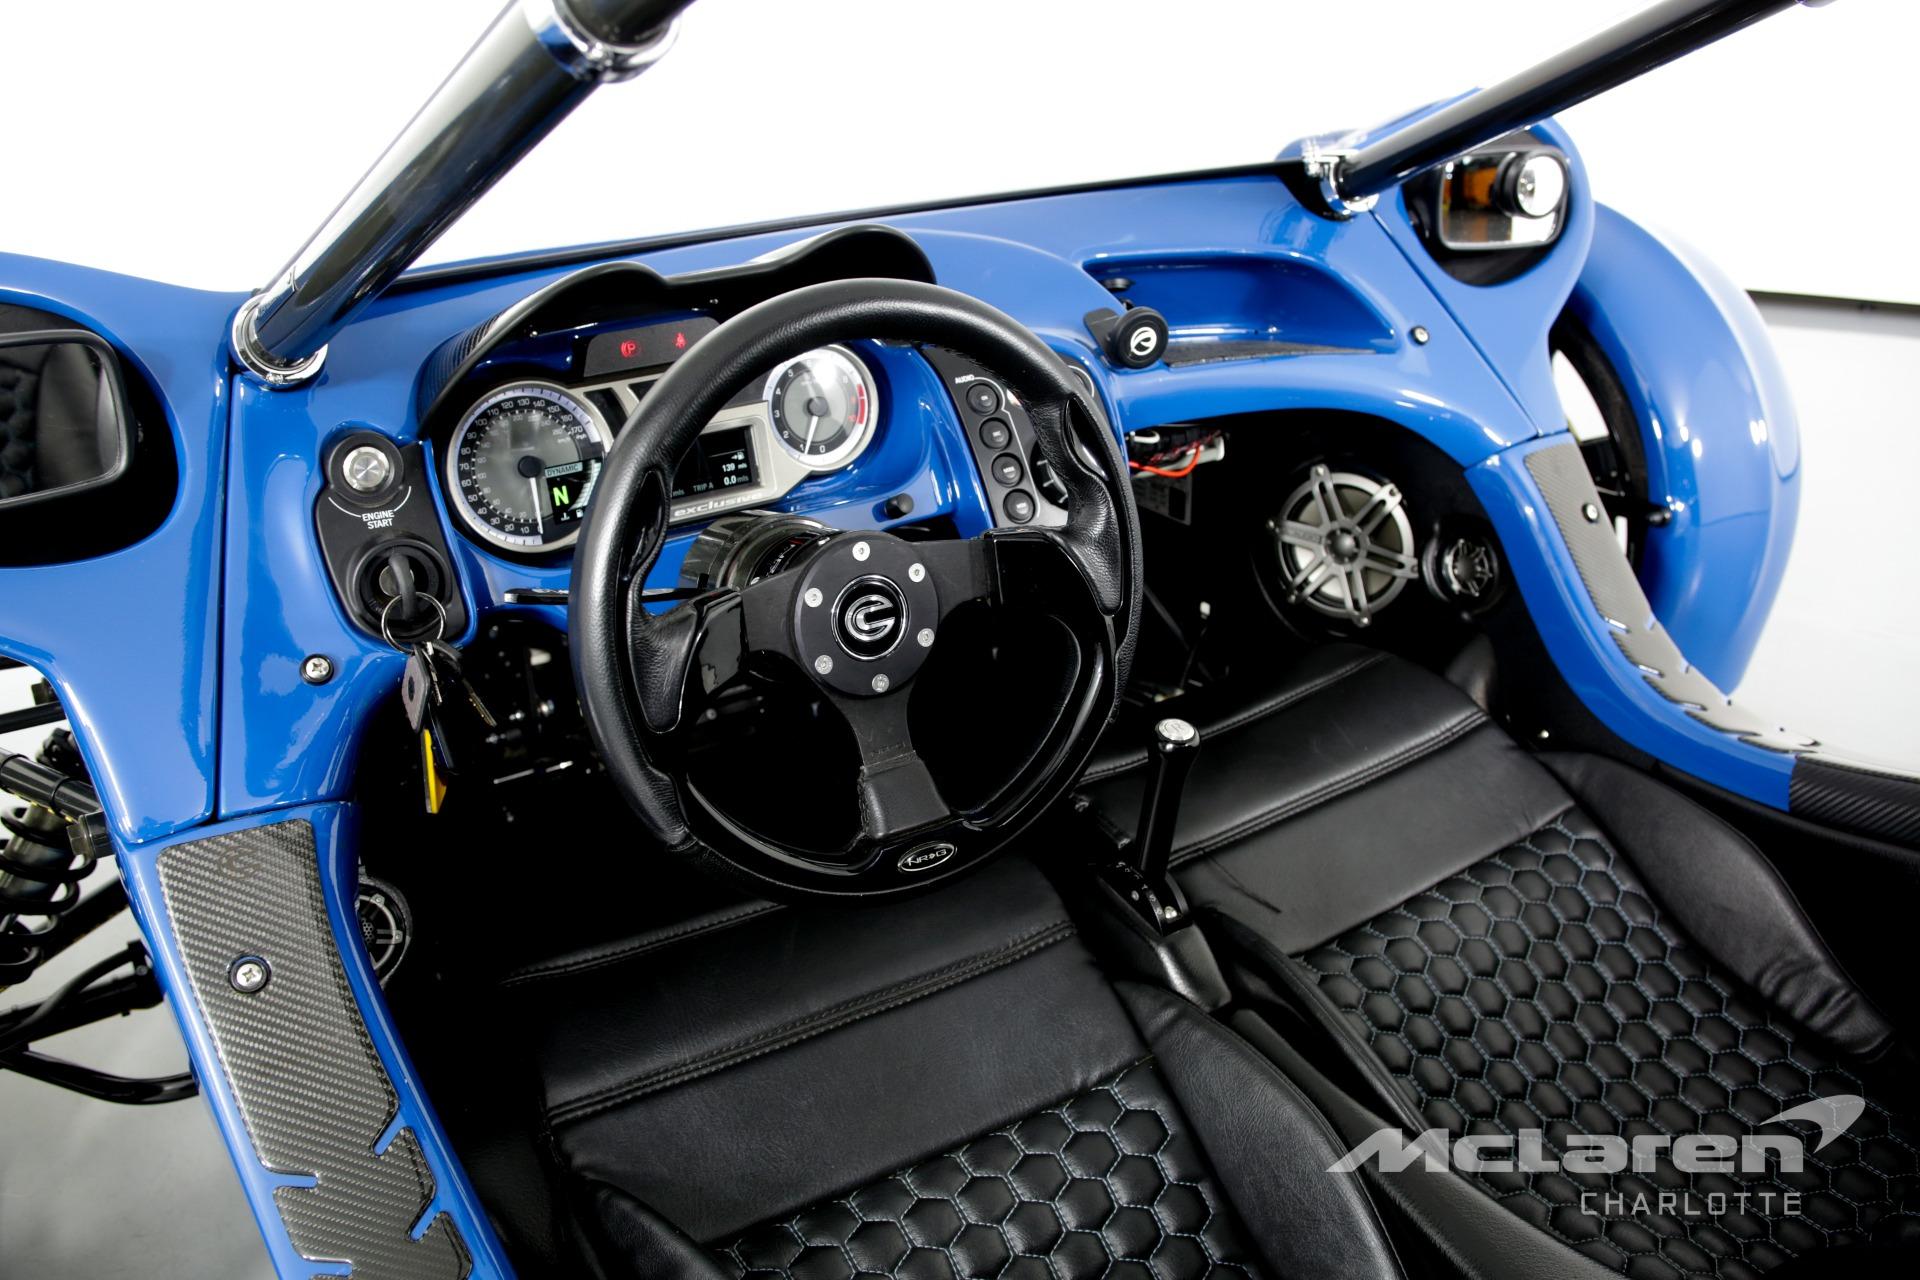 Used 2016 BMW T-REX  | Charlotte, NC